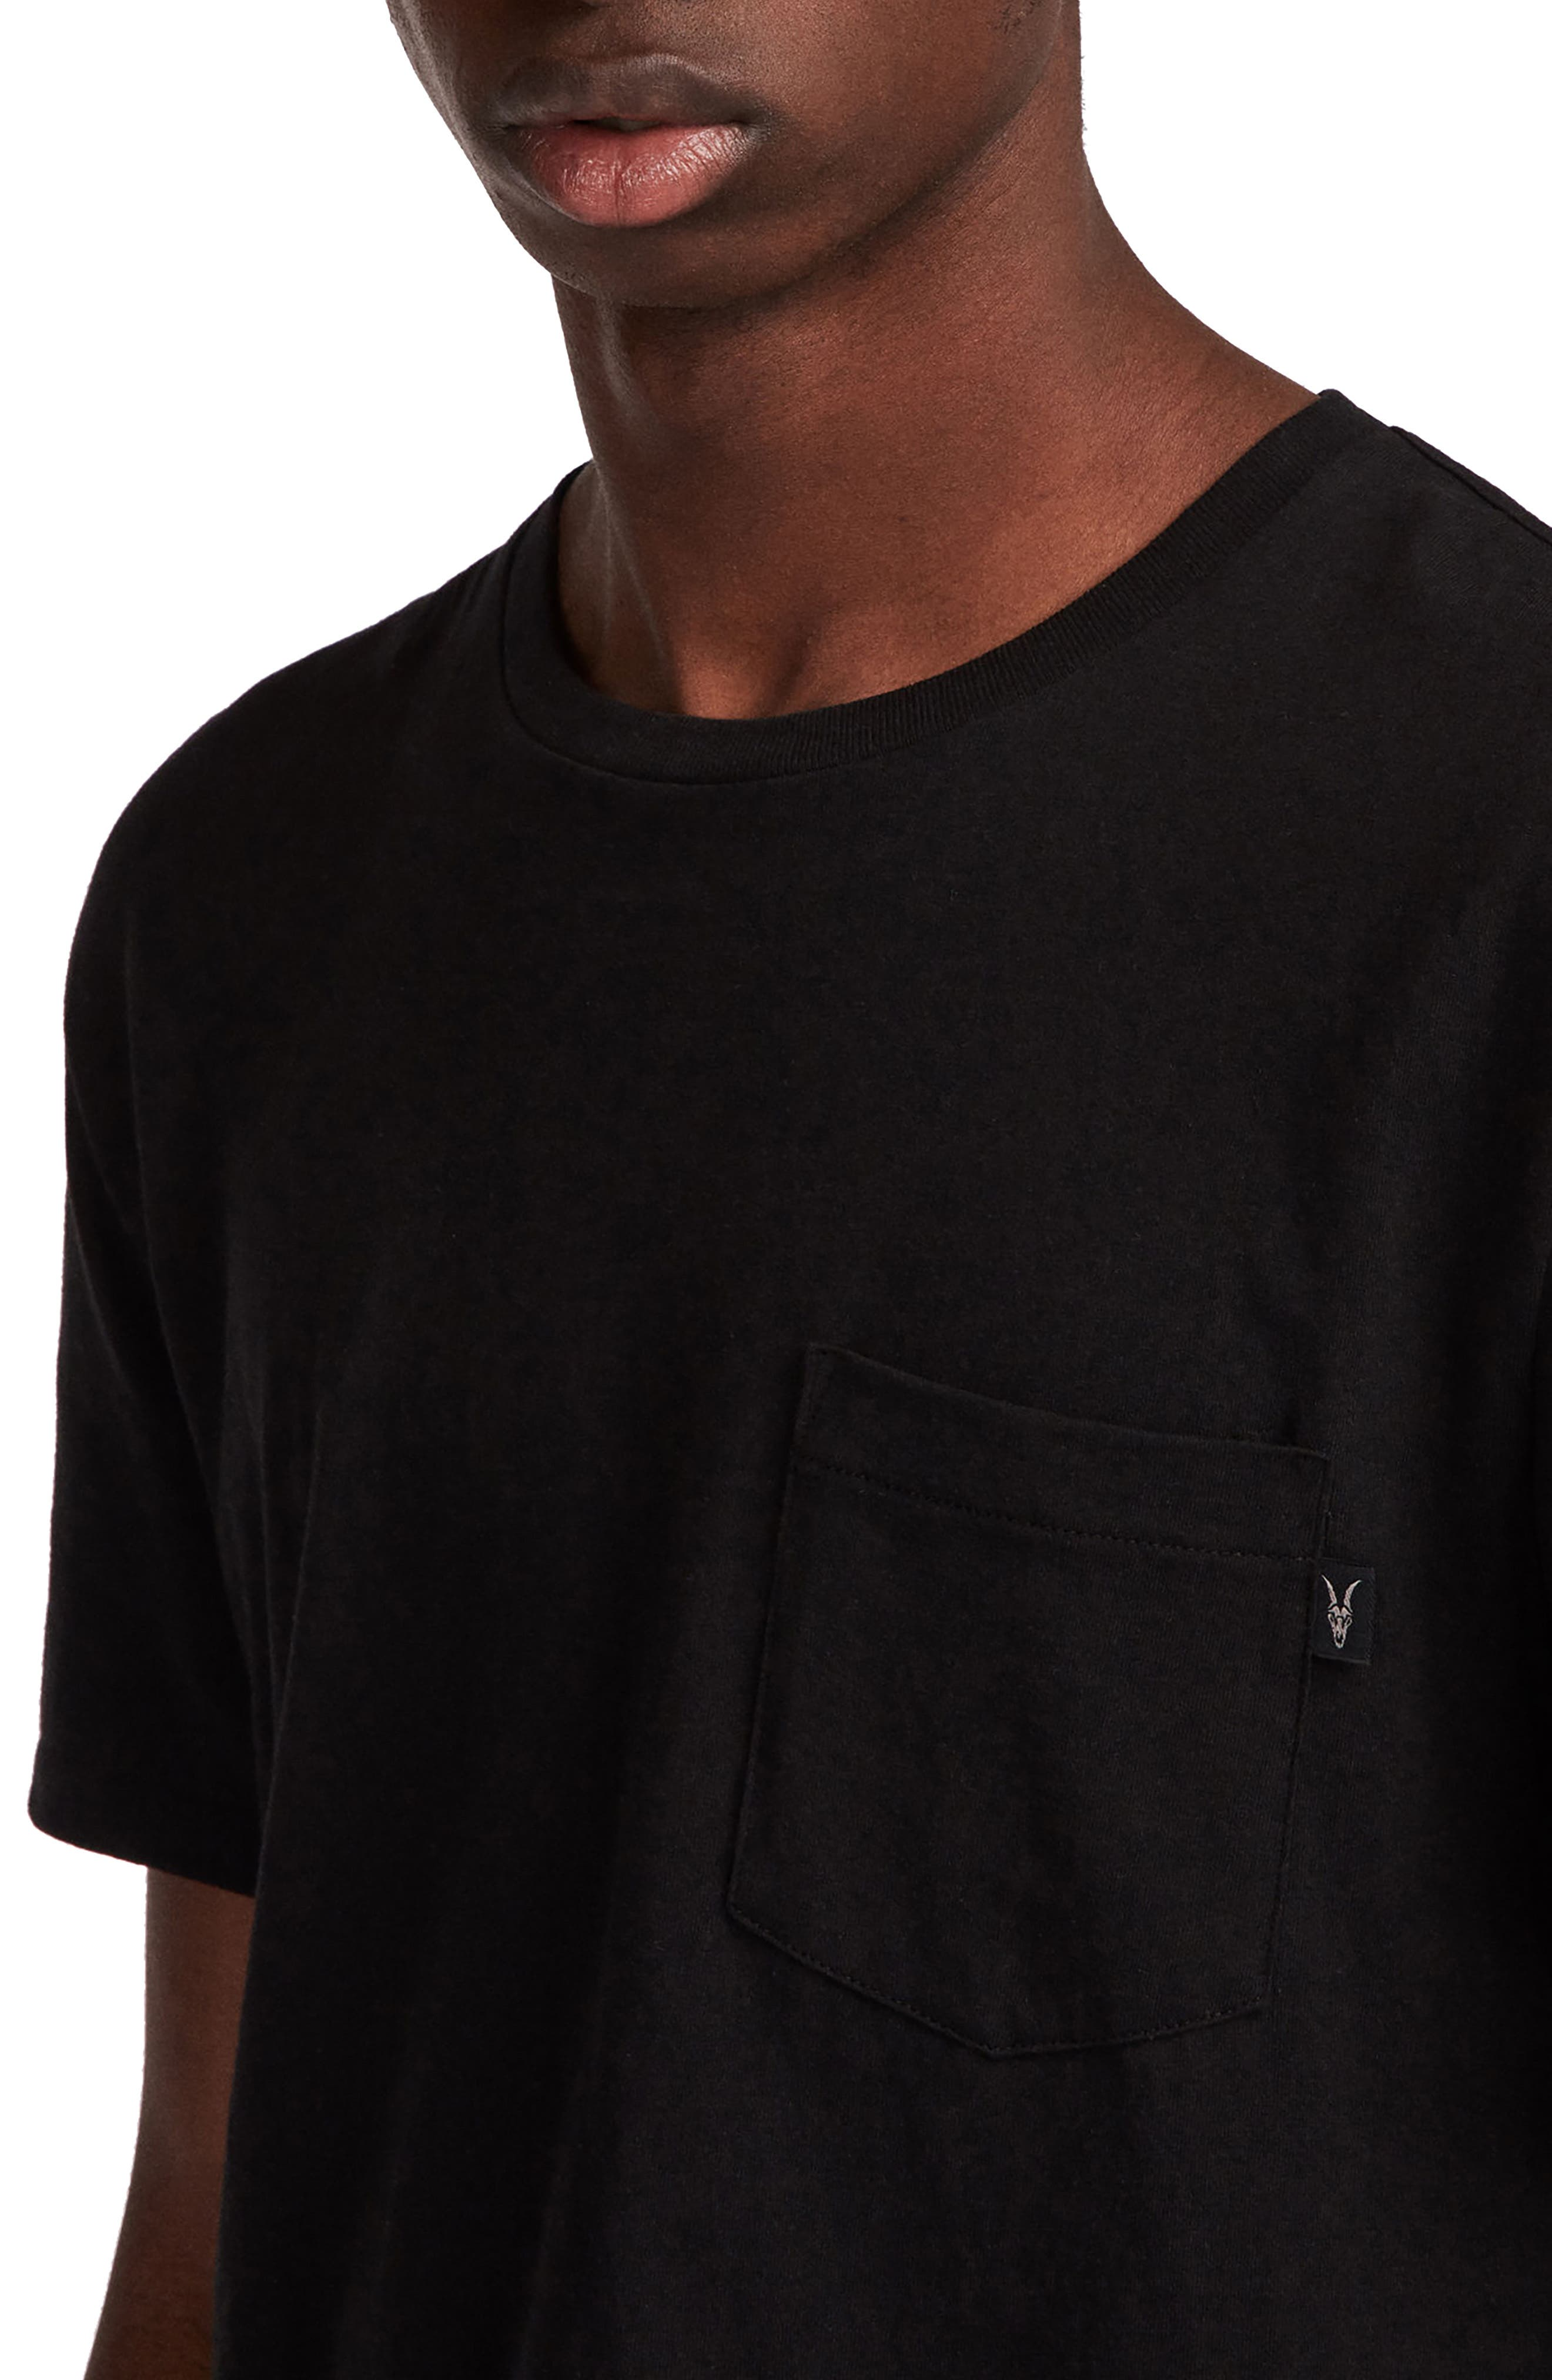 Cure Tonic Slim Fit Pocket T-Shirt,                             Alternate thumbnail 3, color,                             003